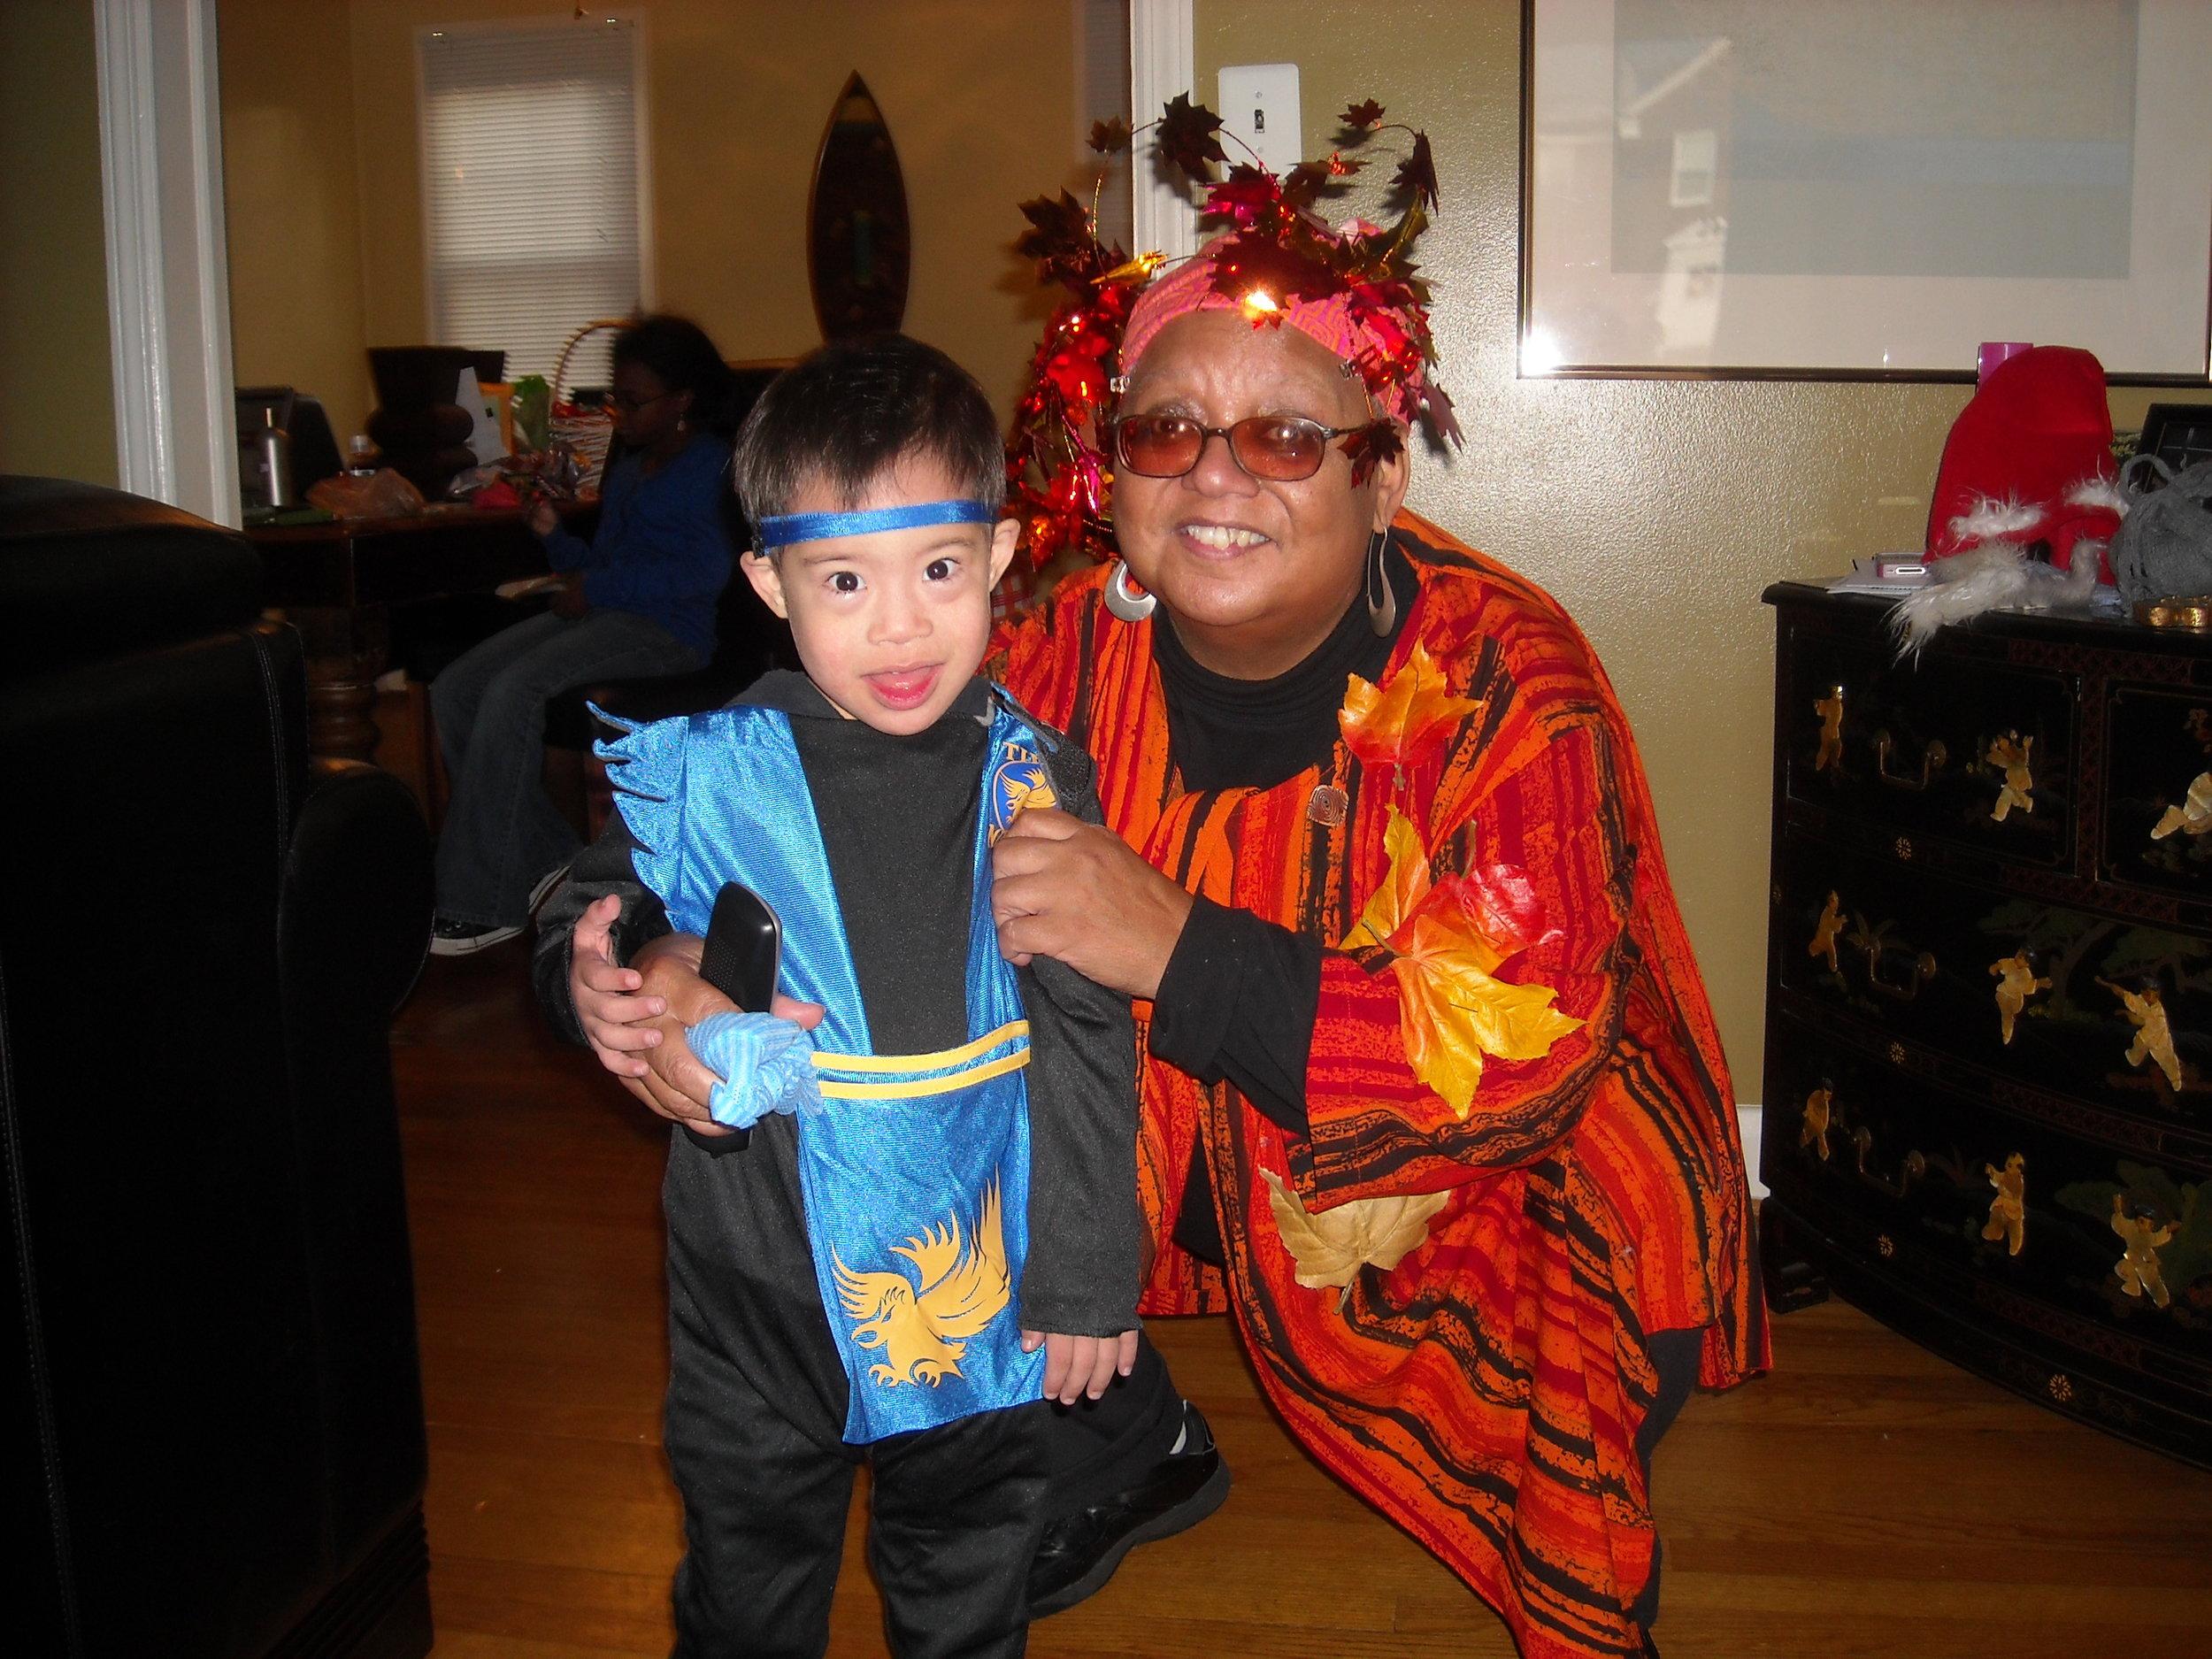 Nikya Green - photo2 Sandi her mom at Halloween party.JPG